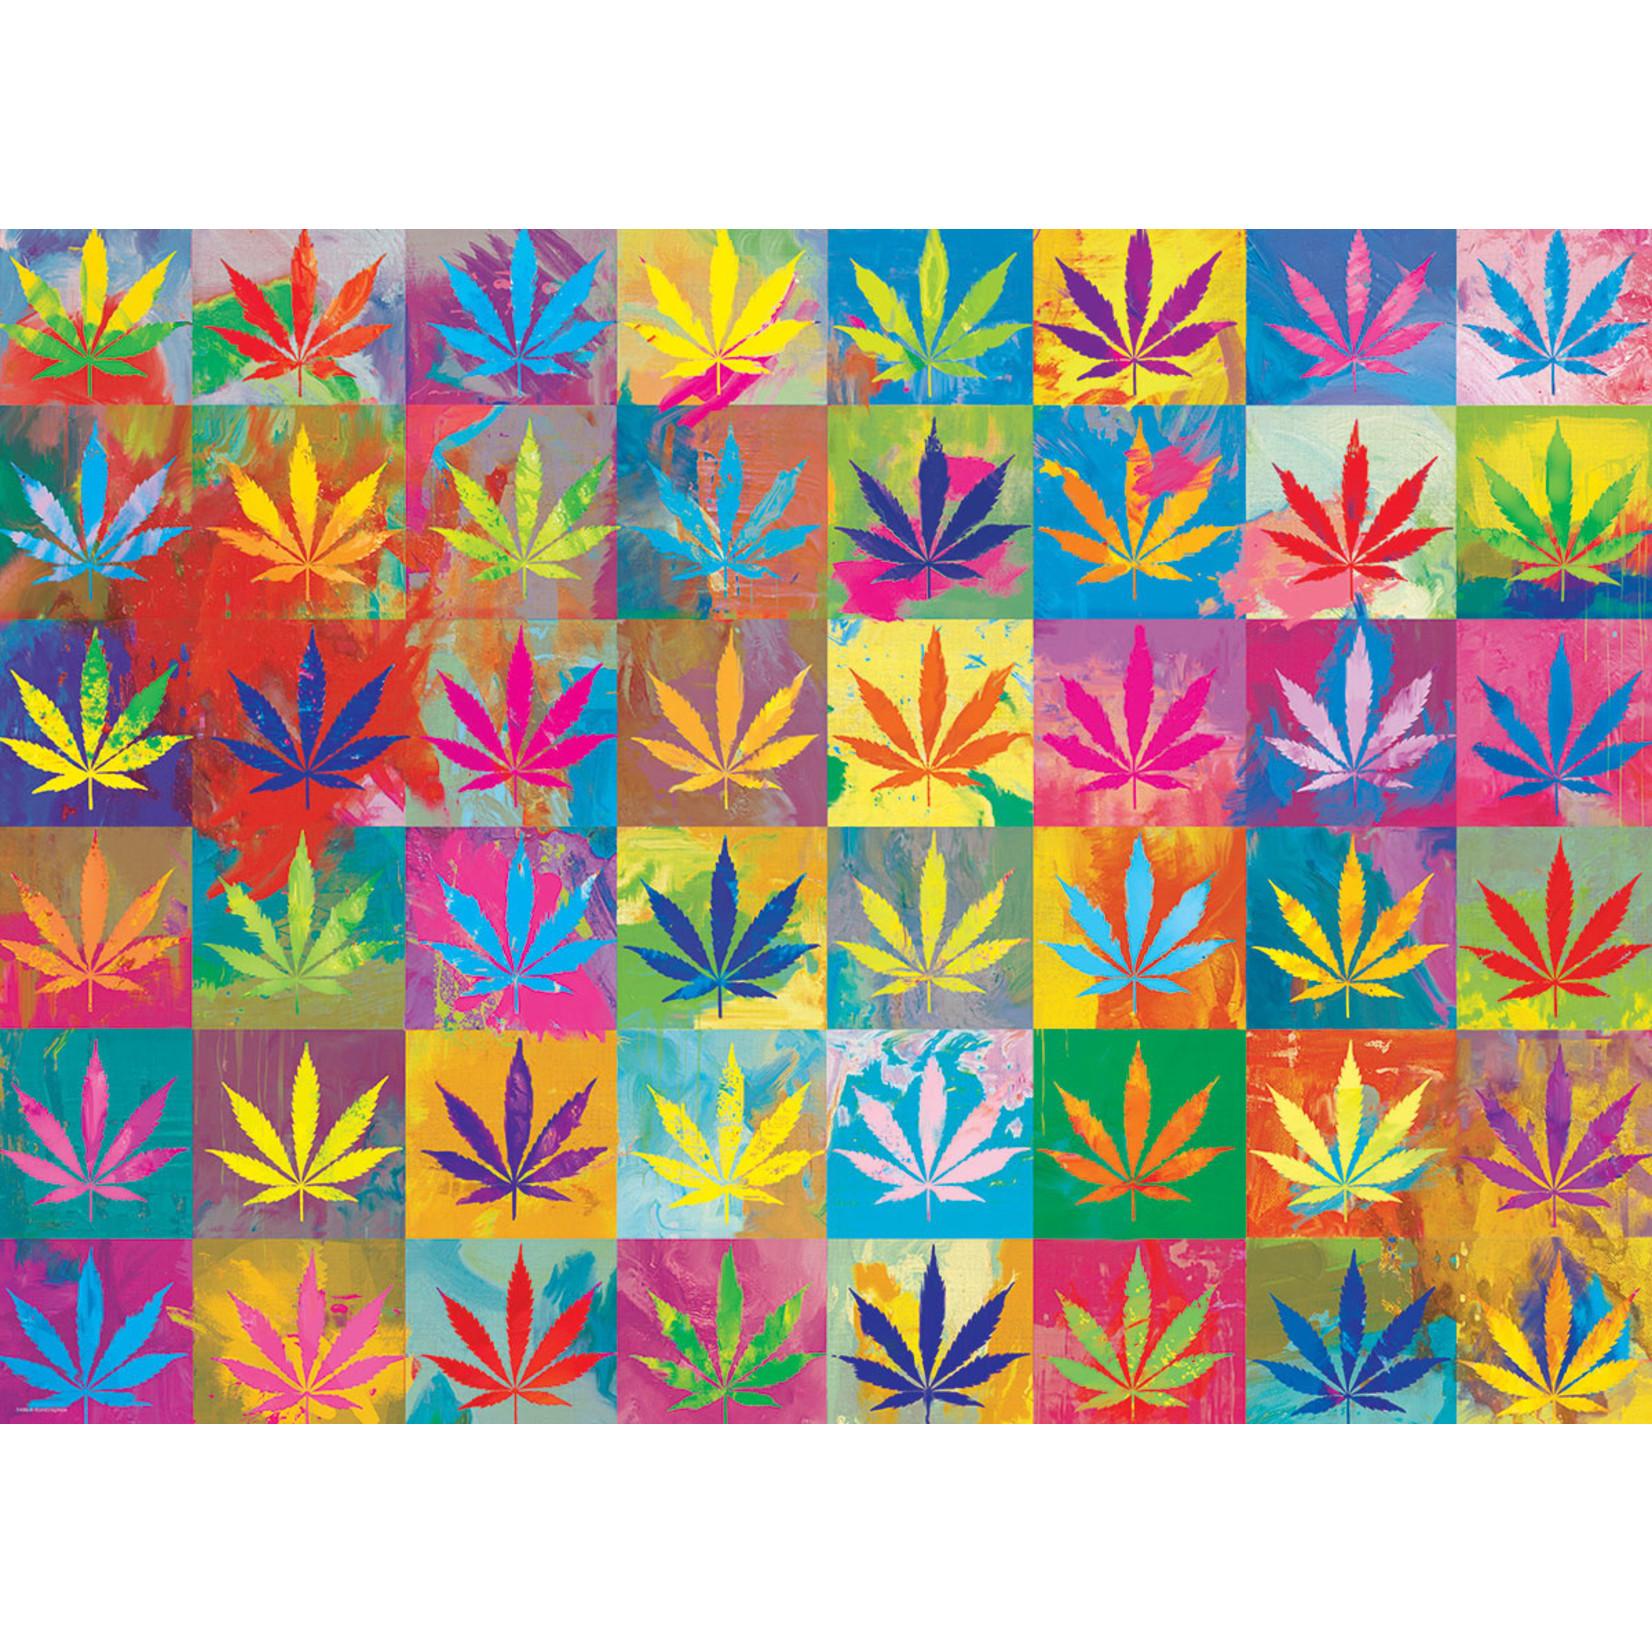 EuroGraphics Puzzles Weed Wonderland 1000pc